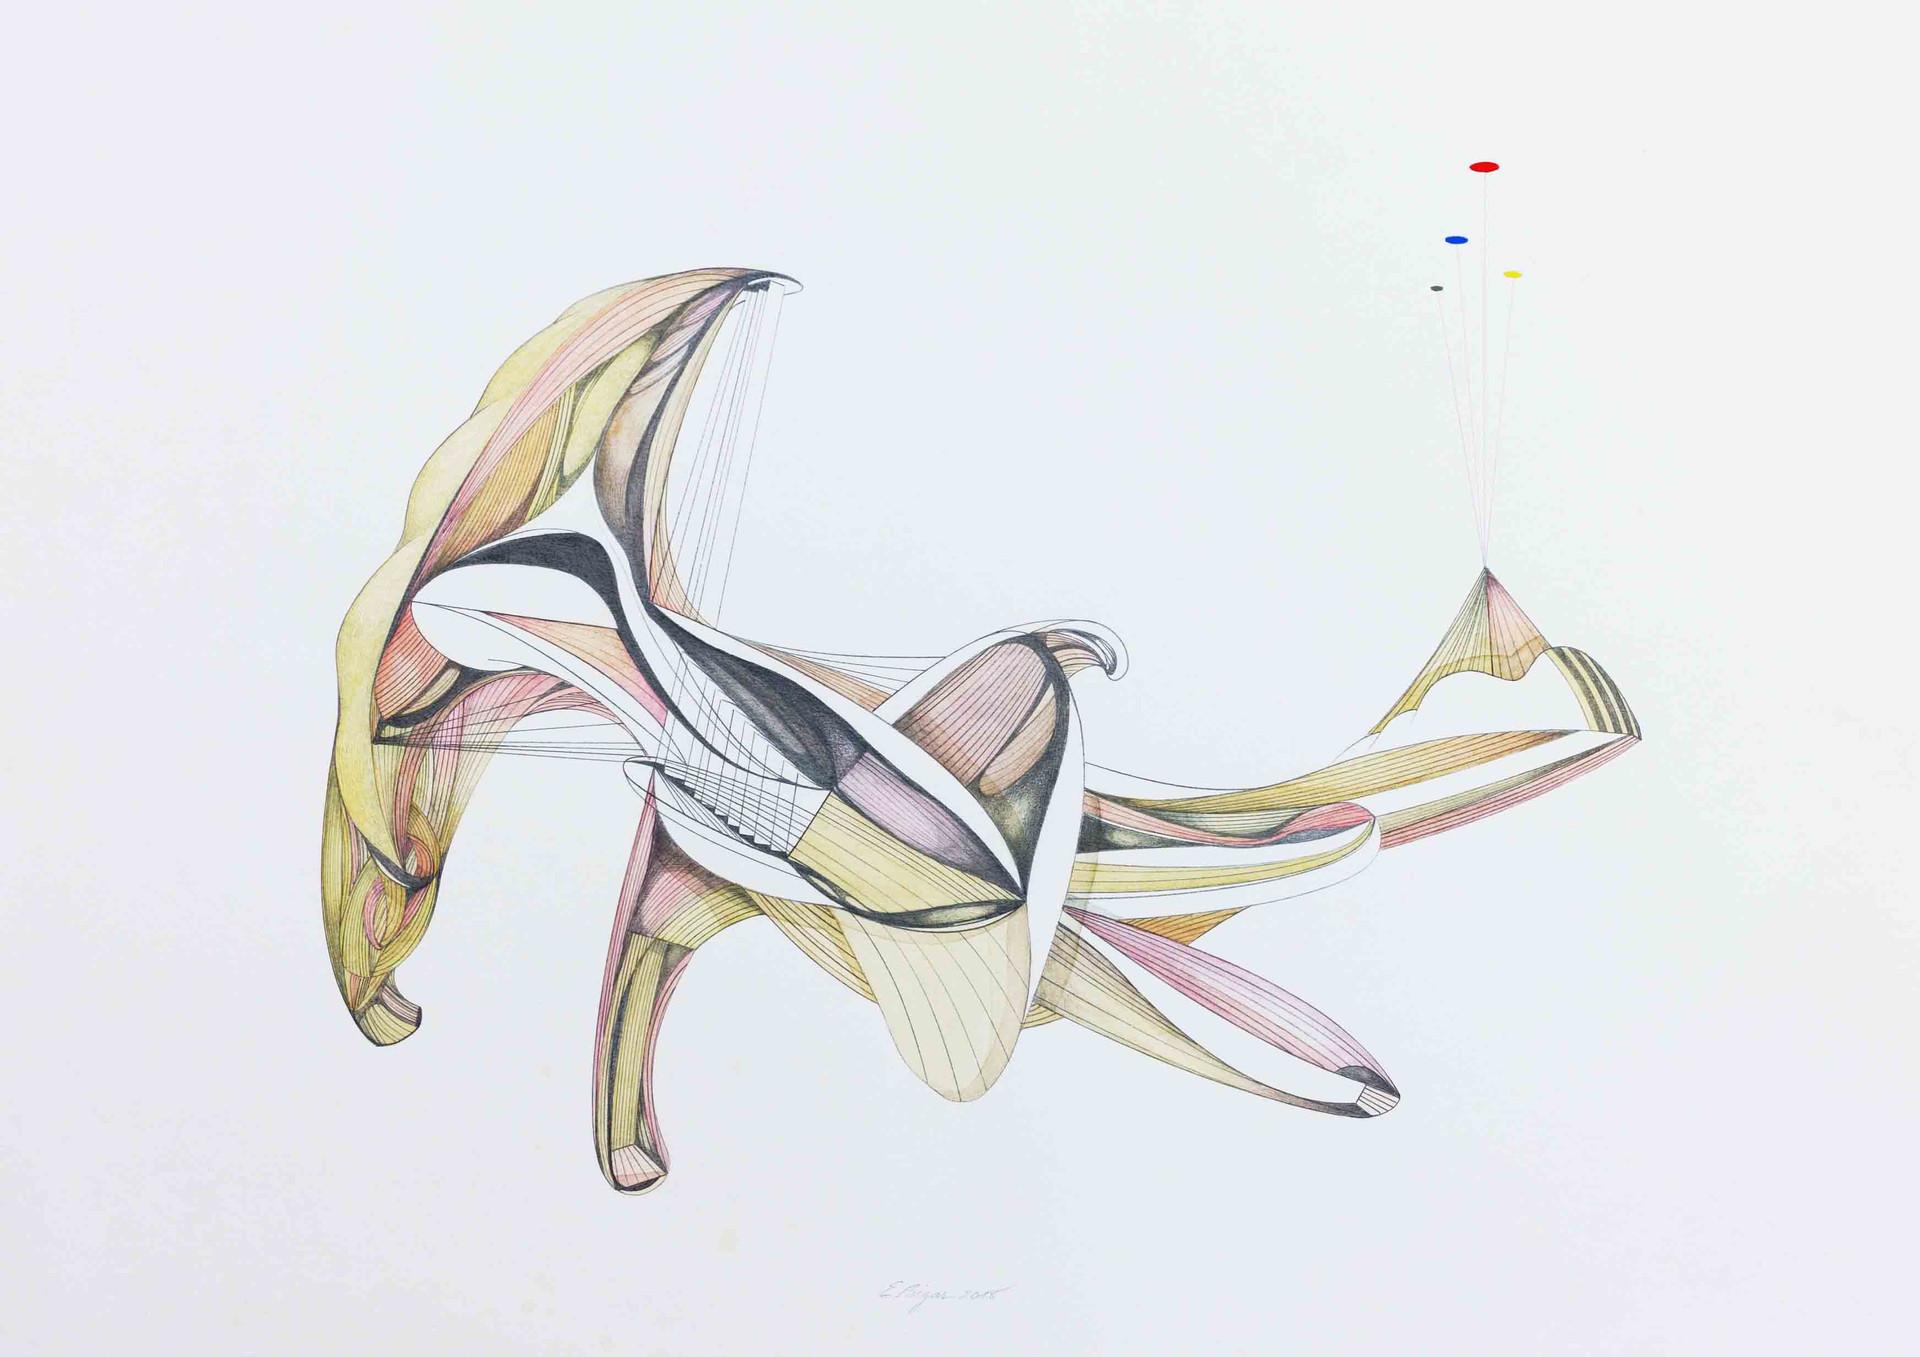 Cronus 2018 70x50cm Graphite pencil and watercolour on paper